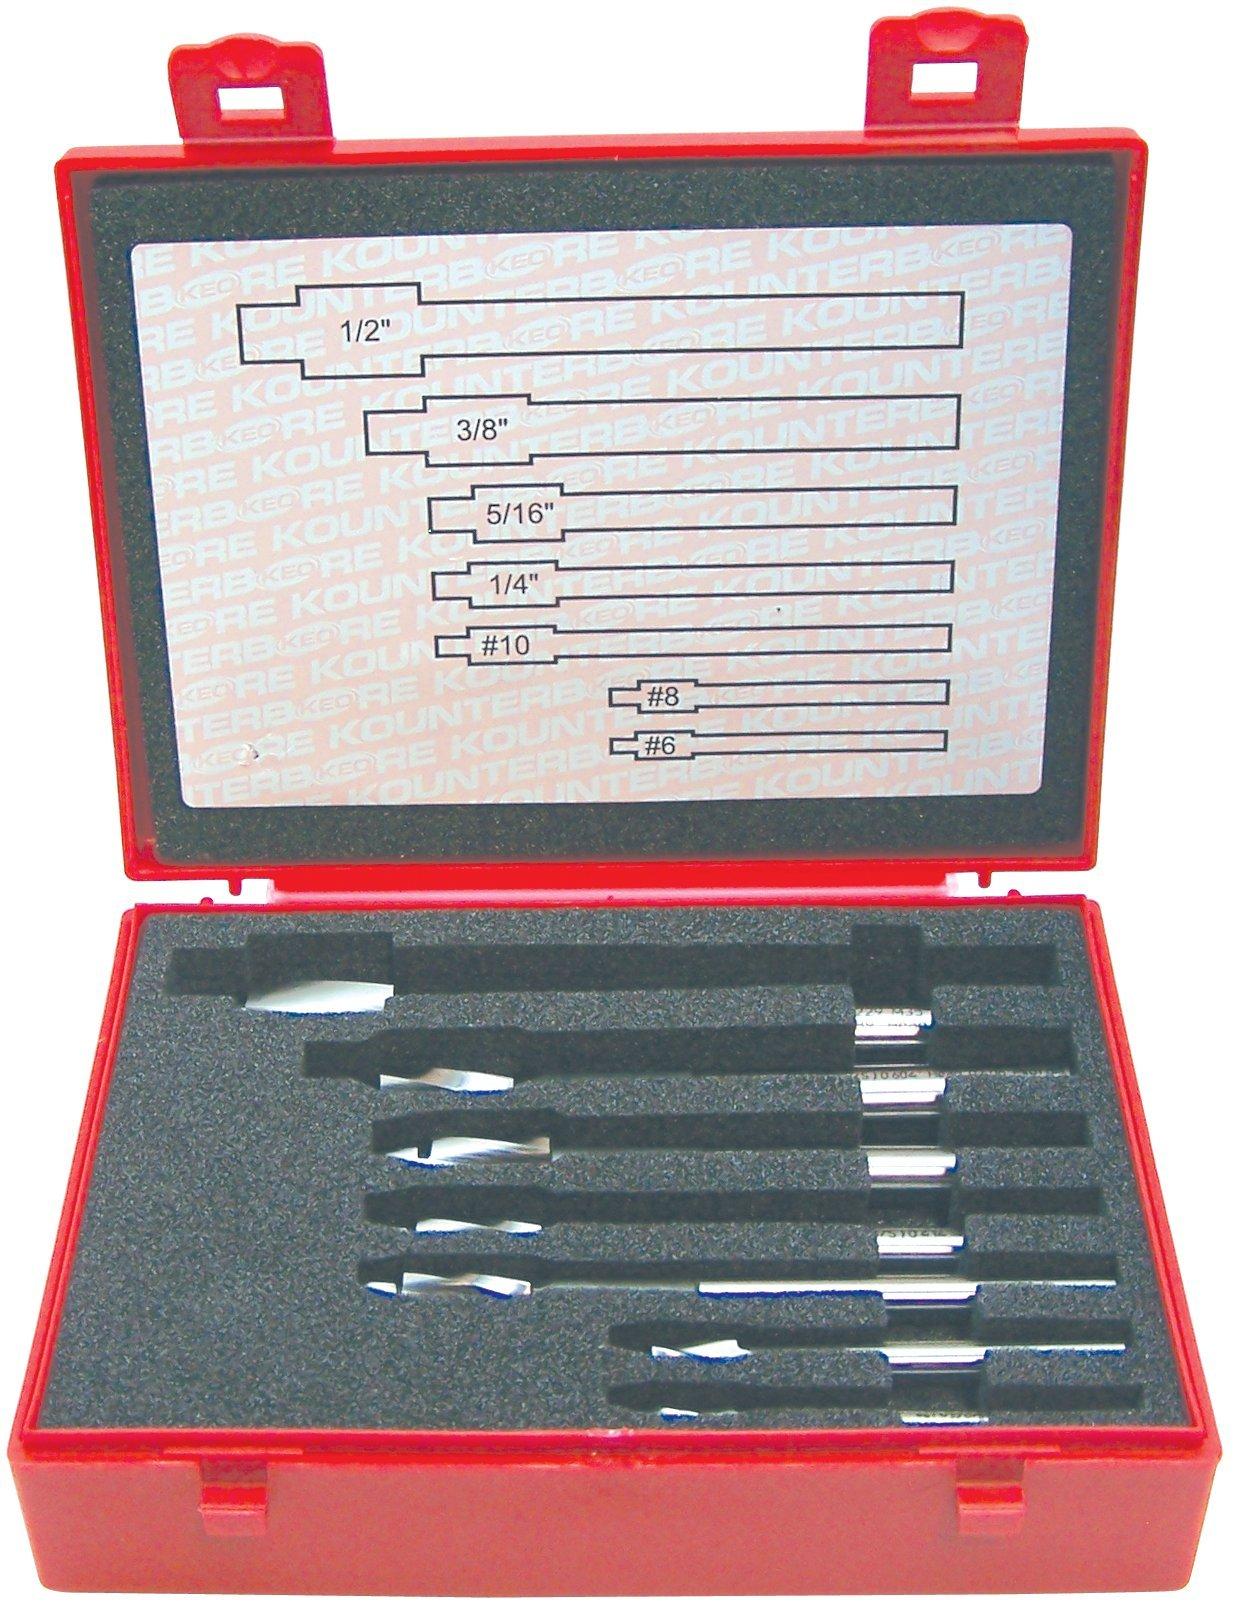 KEO 55239 Tool Precision Cap Screw Counterbore Set, Close Fit, #6 - #10 and 1/4'' - 1/2'' Sizes